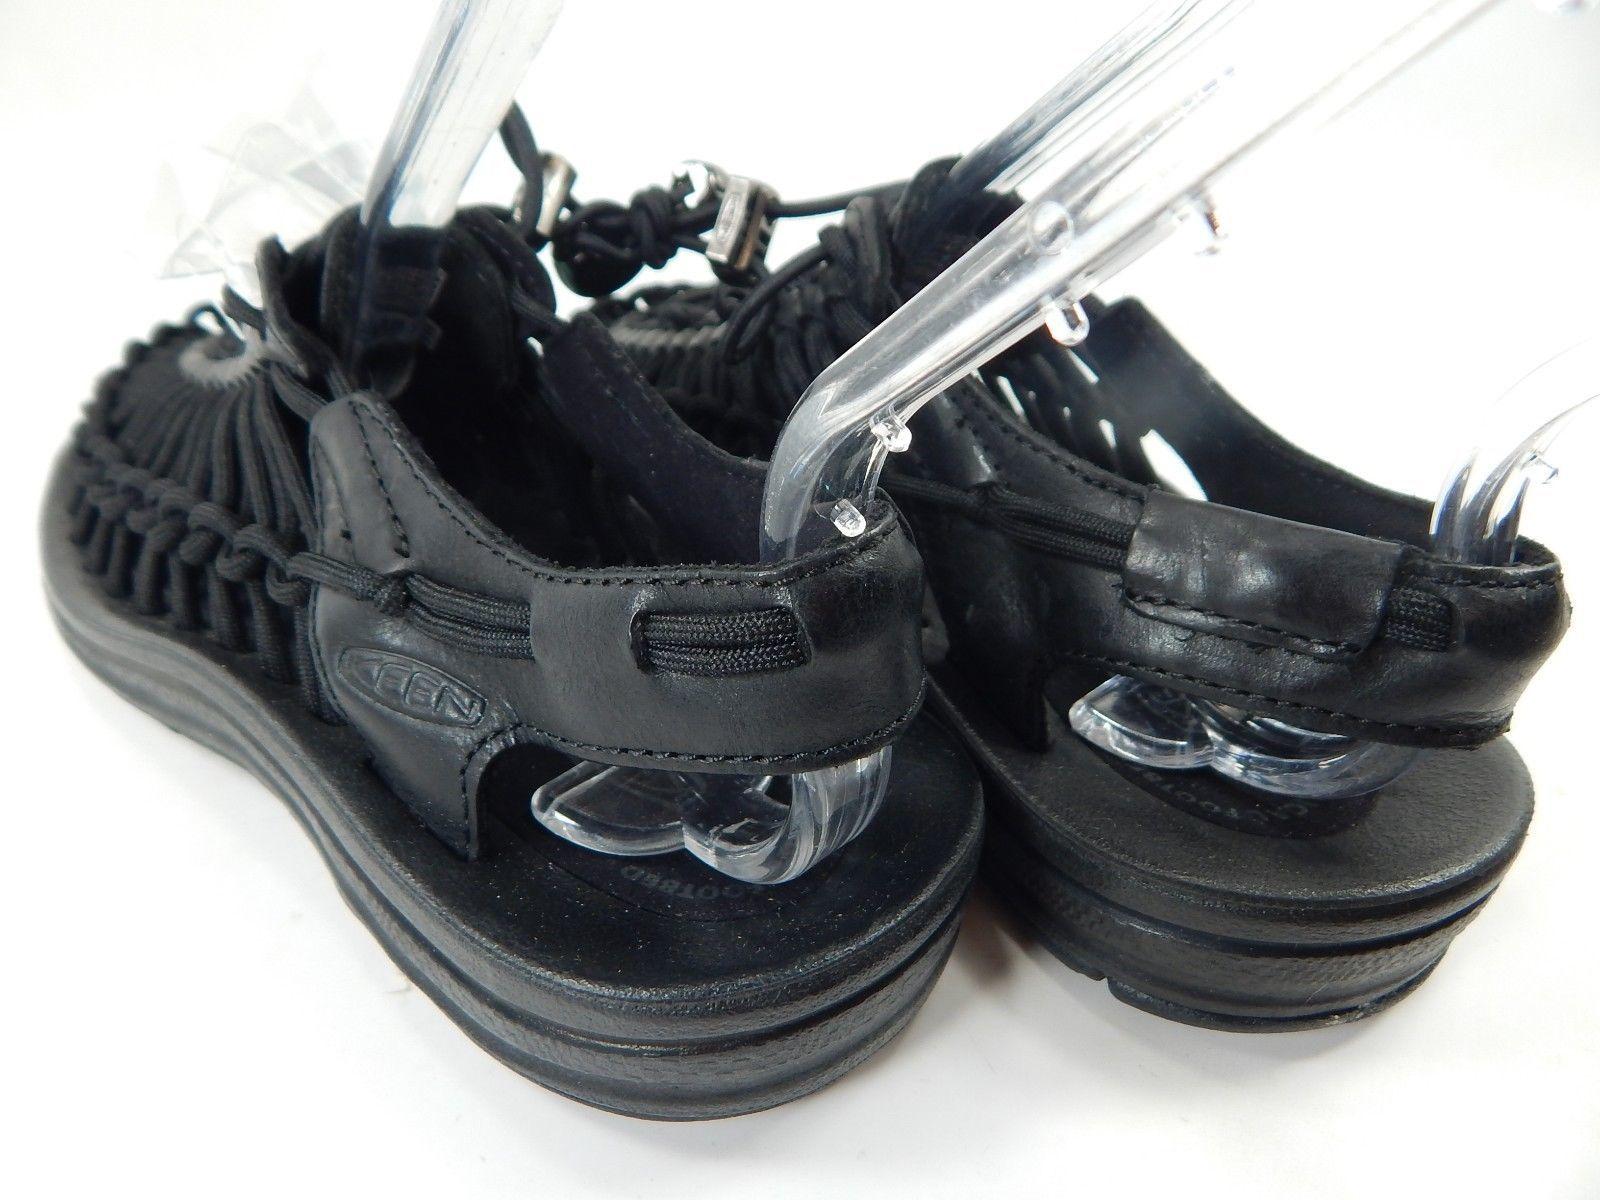 0eb0b81f2a53 Keen Uneek Leather Women s Sport Sandals Size US 7 M (B) EU 37.5 Black